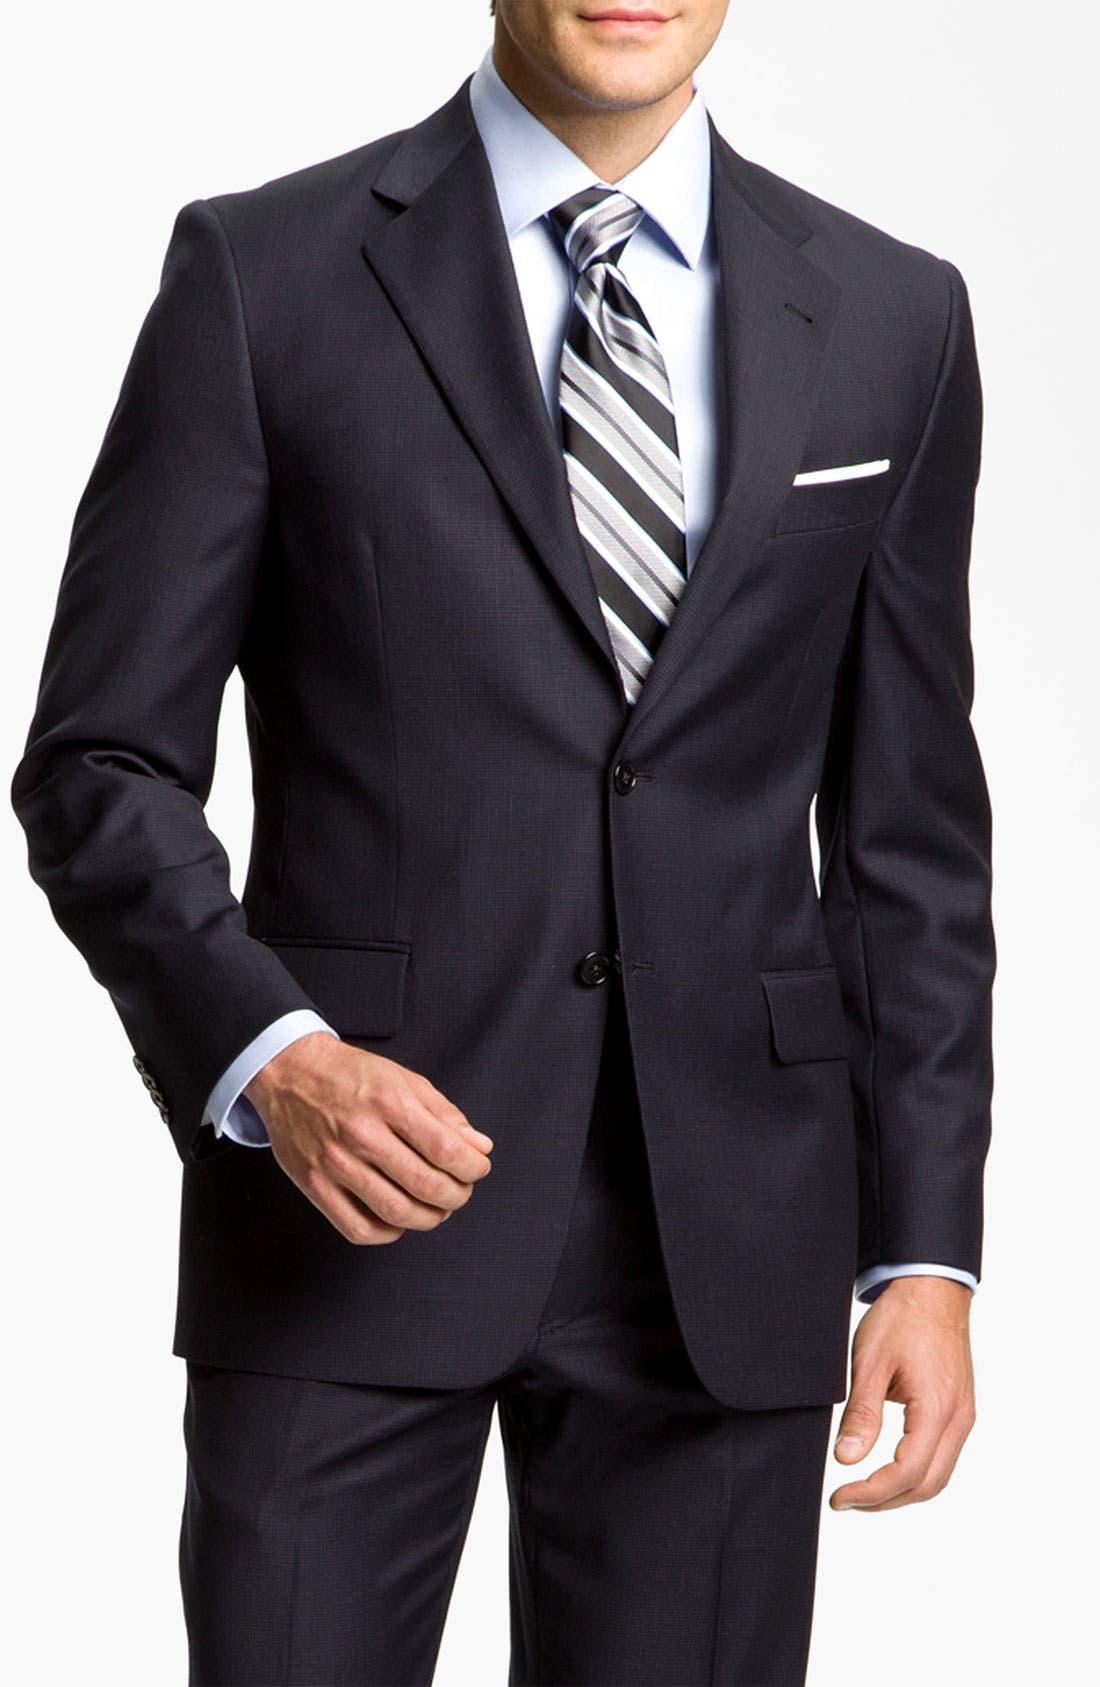 Main Image - Joseph Abboud 'Profile Hybrid Signature' Wool Suit